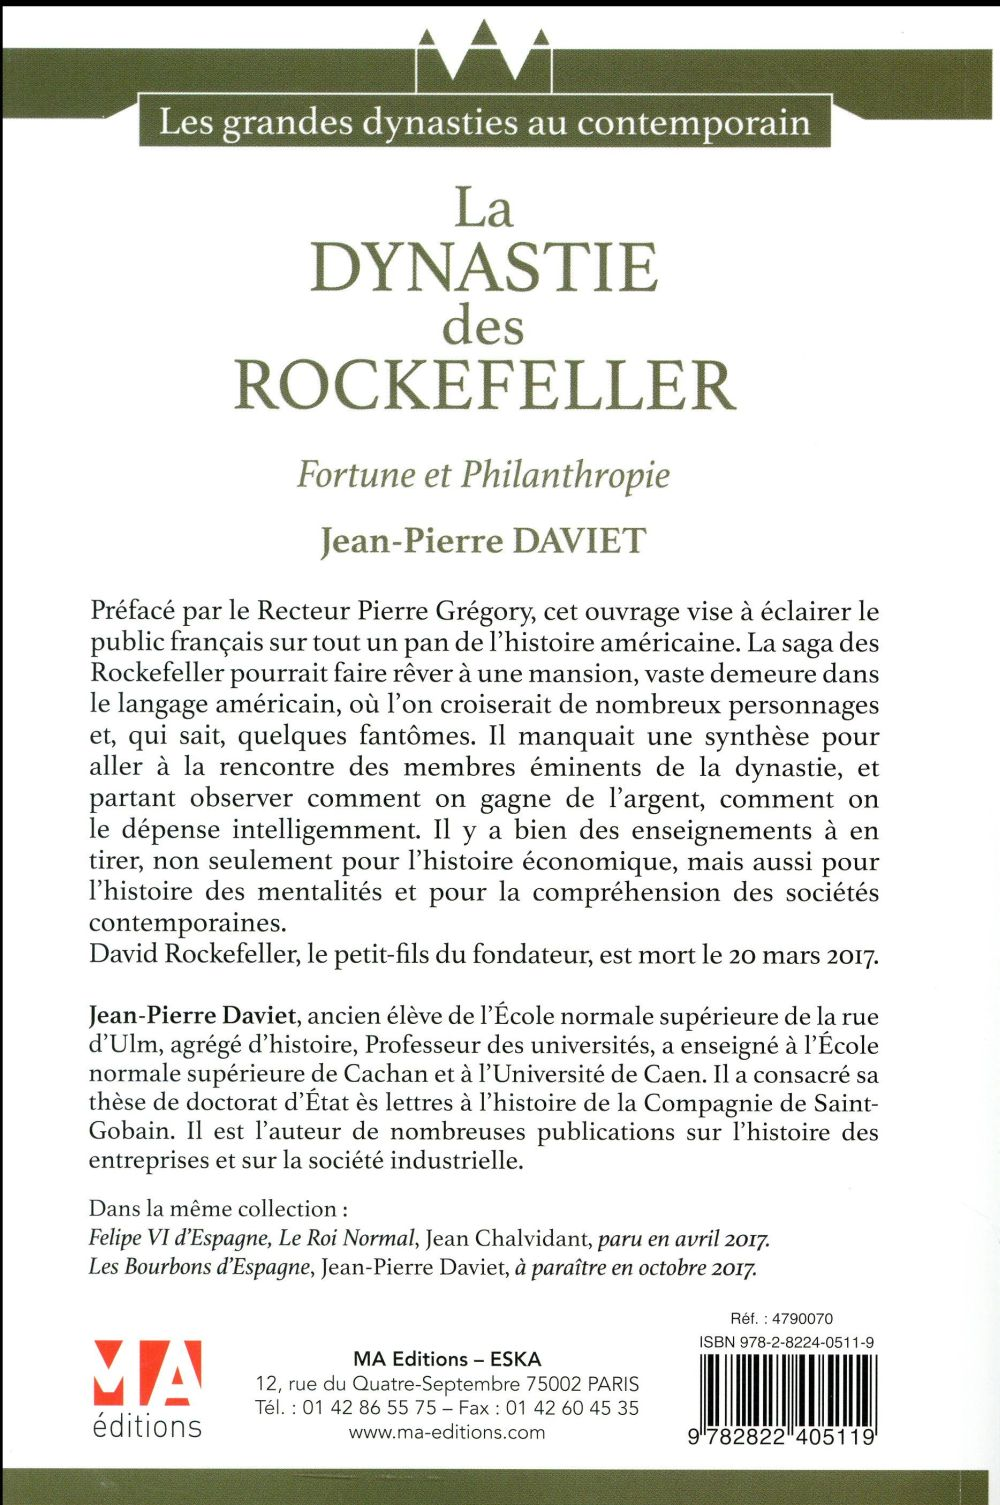 La dynastie des Rockefeller ; fortune et philanthropie